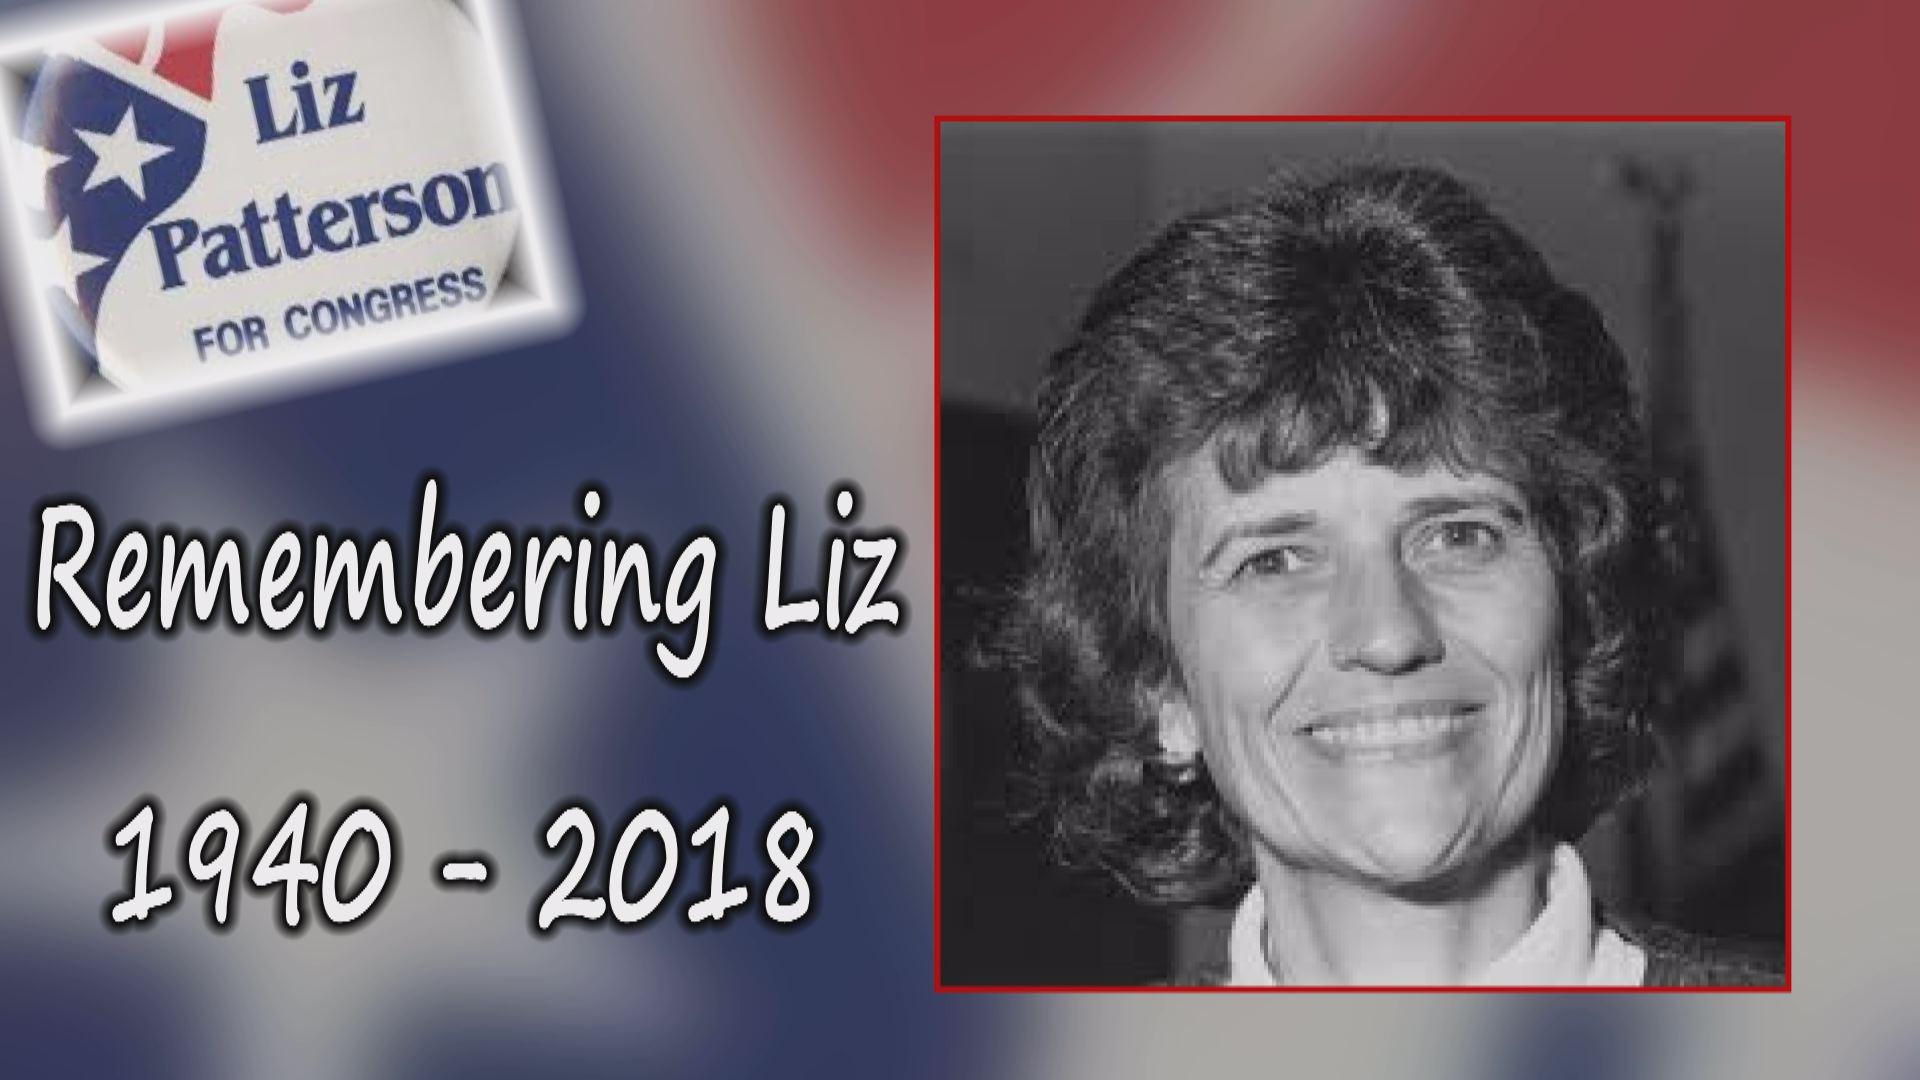 Remembering Liz PRODUCED_1552024059125.jpg.jpg